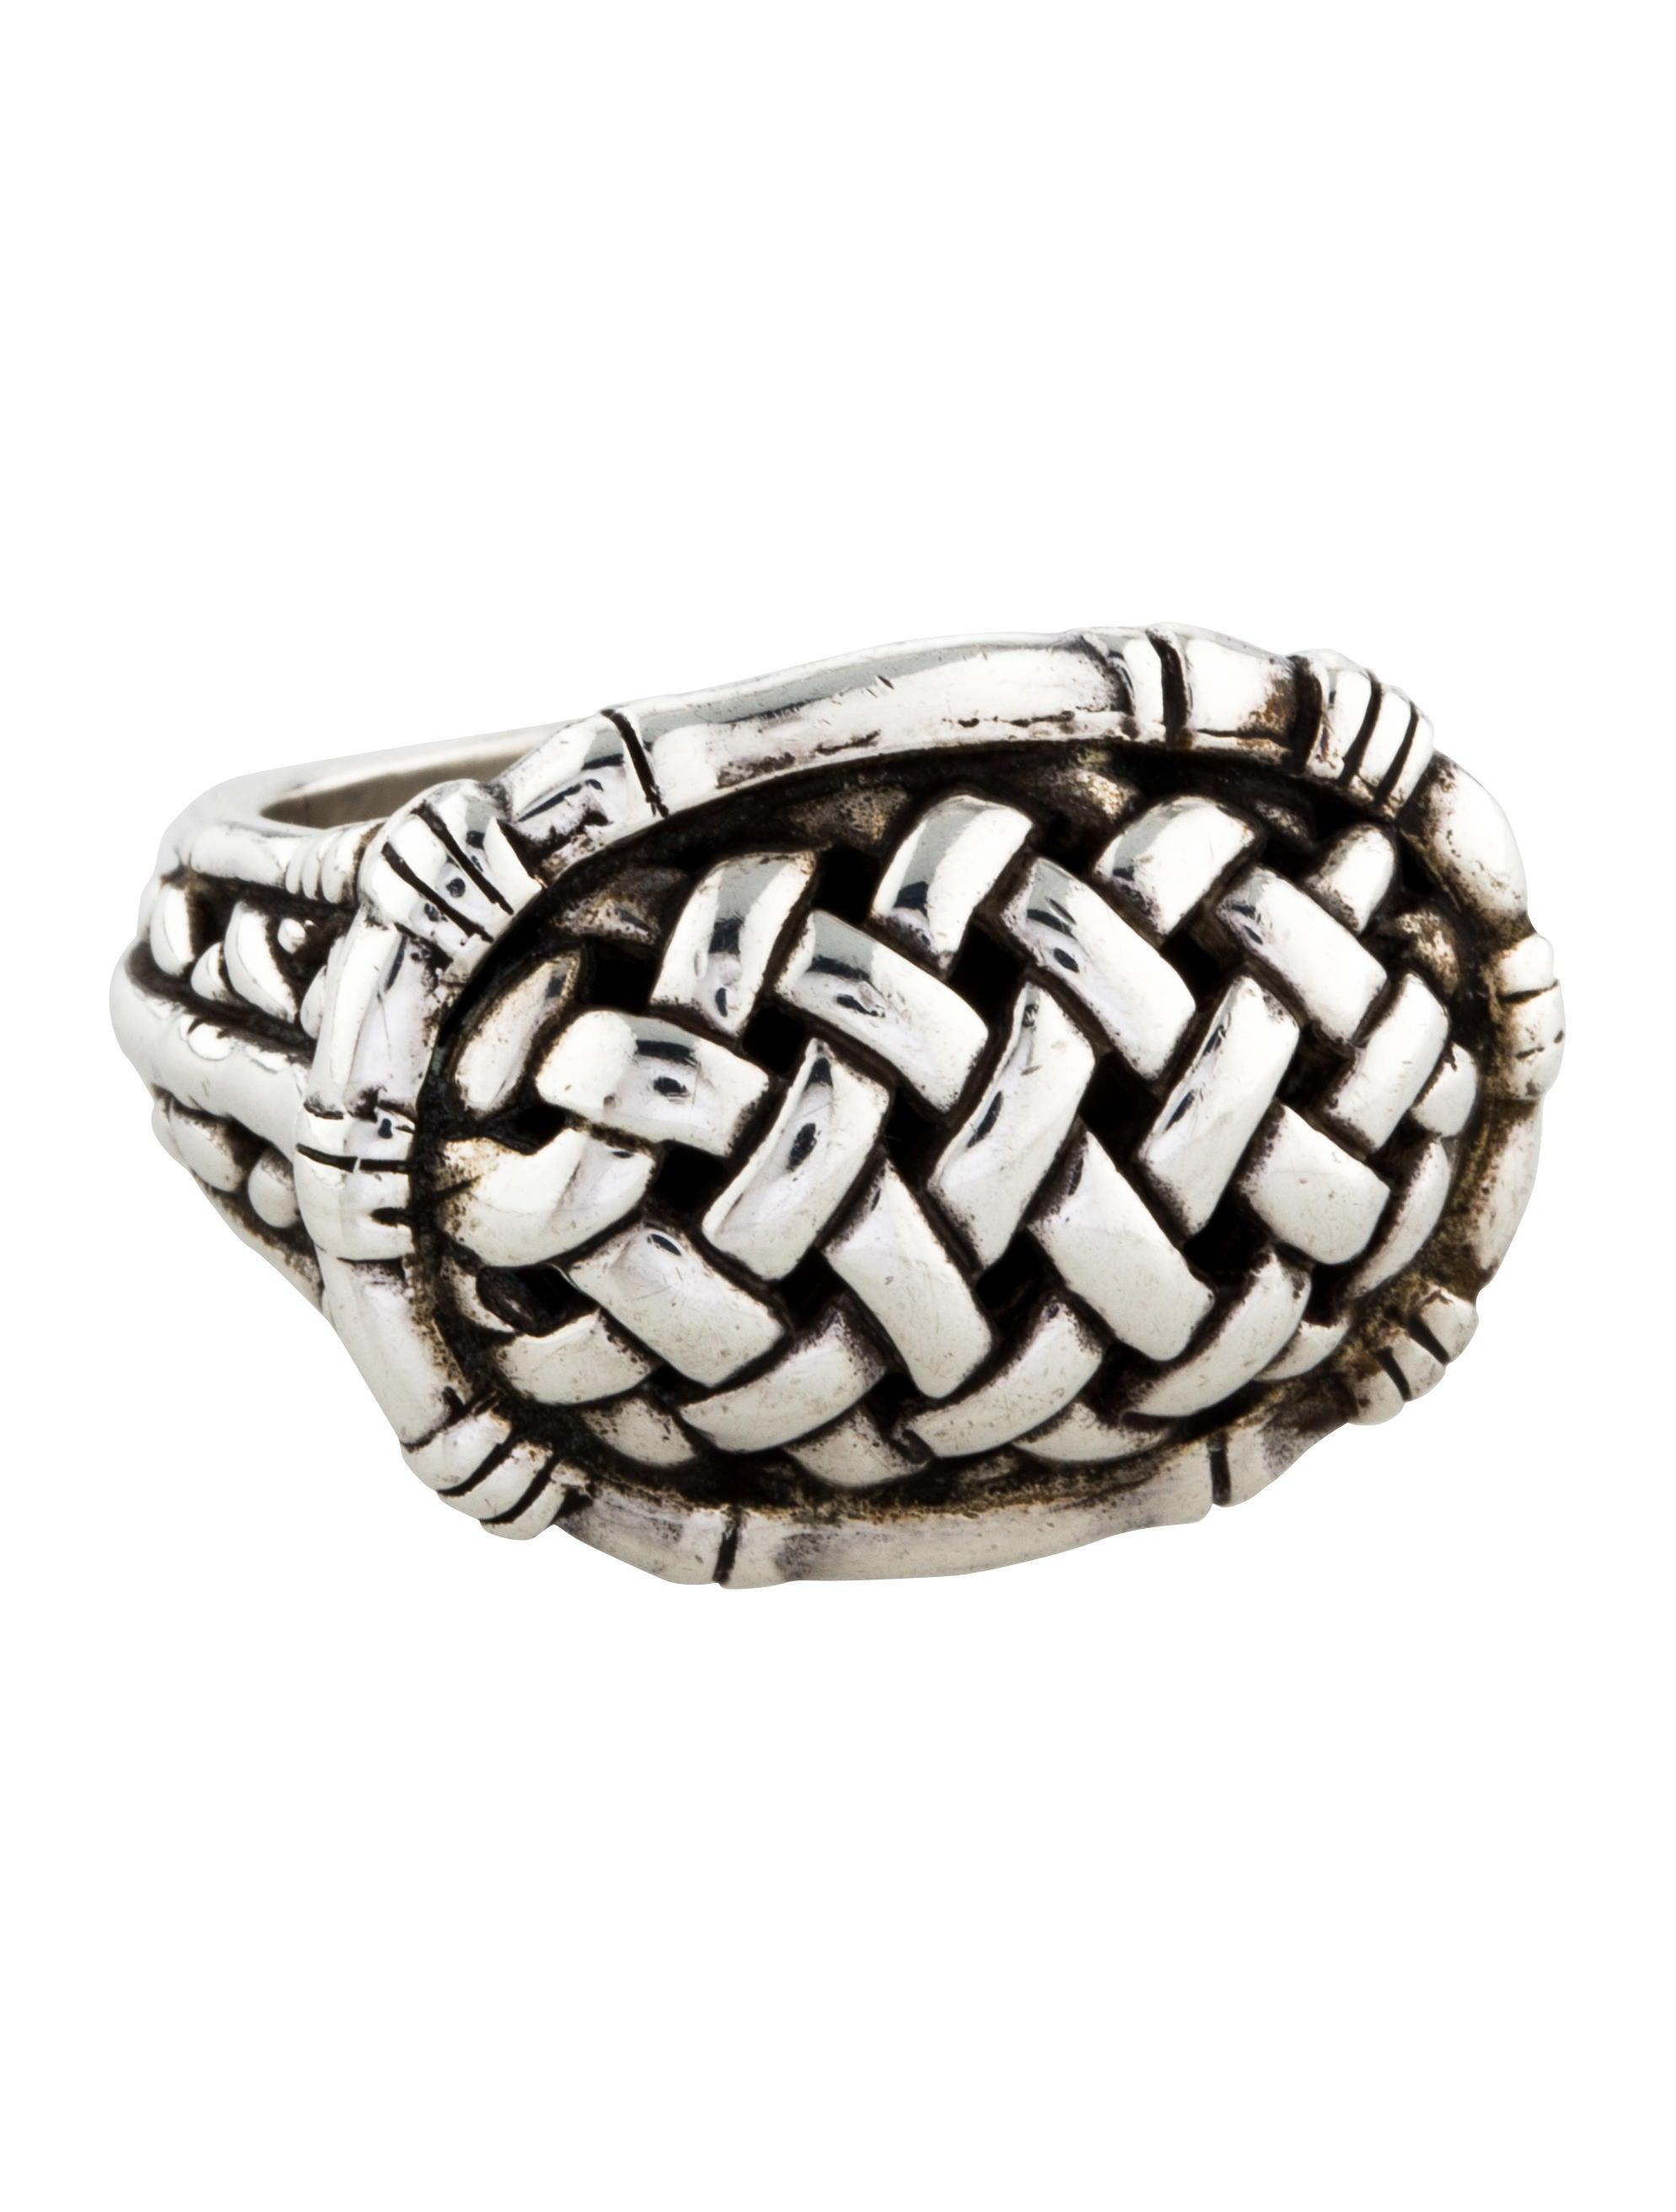 Basket Weaving Jewelry : John hardy basket weave ring rings jha the realreal